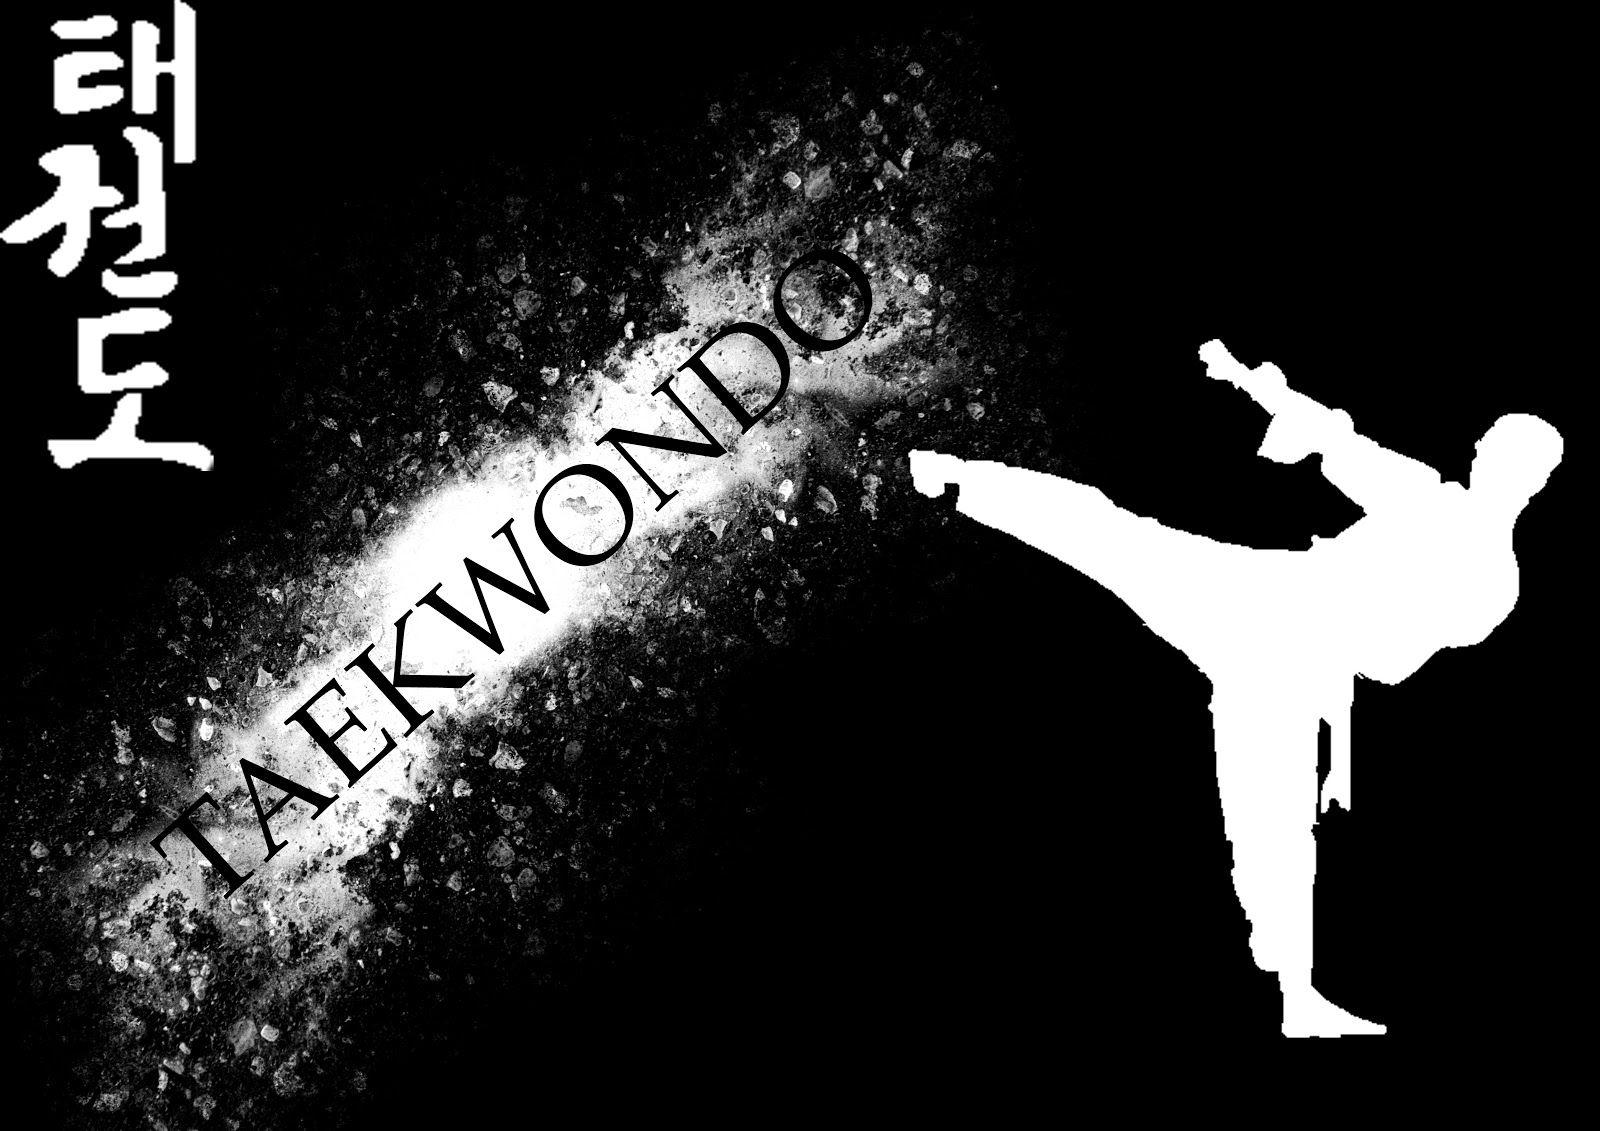 Taekwondo Wallpaper Download Taekwondo Quotes What Is Taekwondo Taekwondo